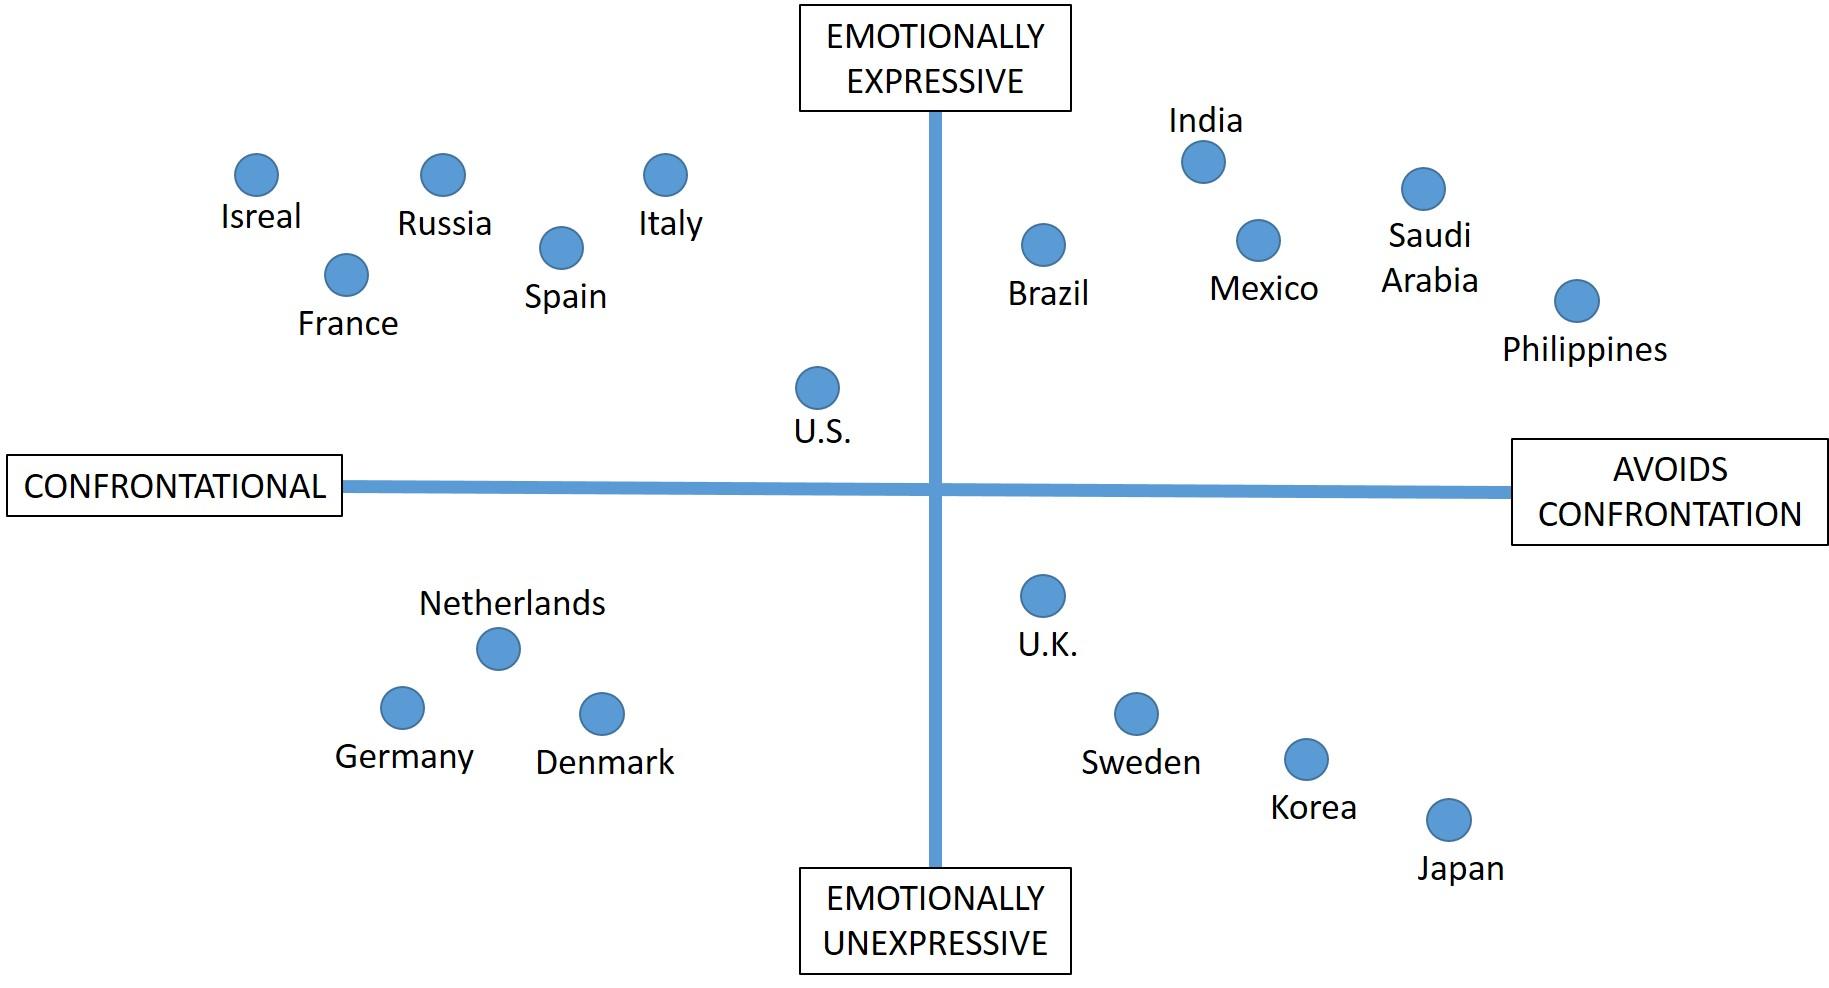 Figure 1: Emotion and Confrontation (Meyer, 2015)